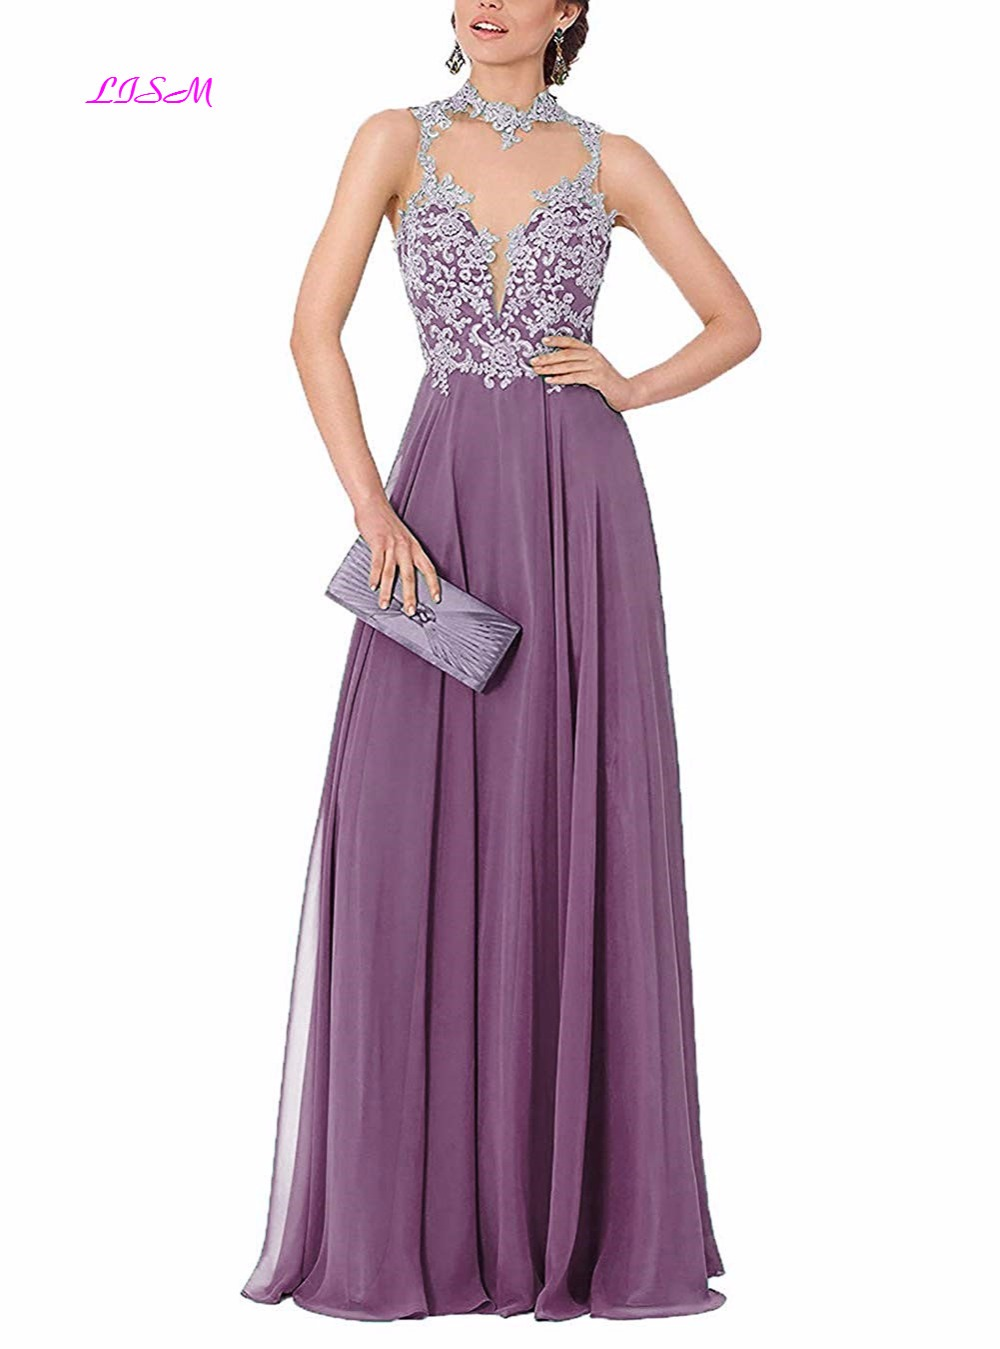 Vestido De Festa Longo Elegant Lace Applique Long Evening Dress Sexy Backless Chiffon Evening Gown Abendkleider vestido de noche in Evening Dresses from Weddings Events